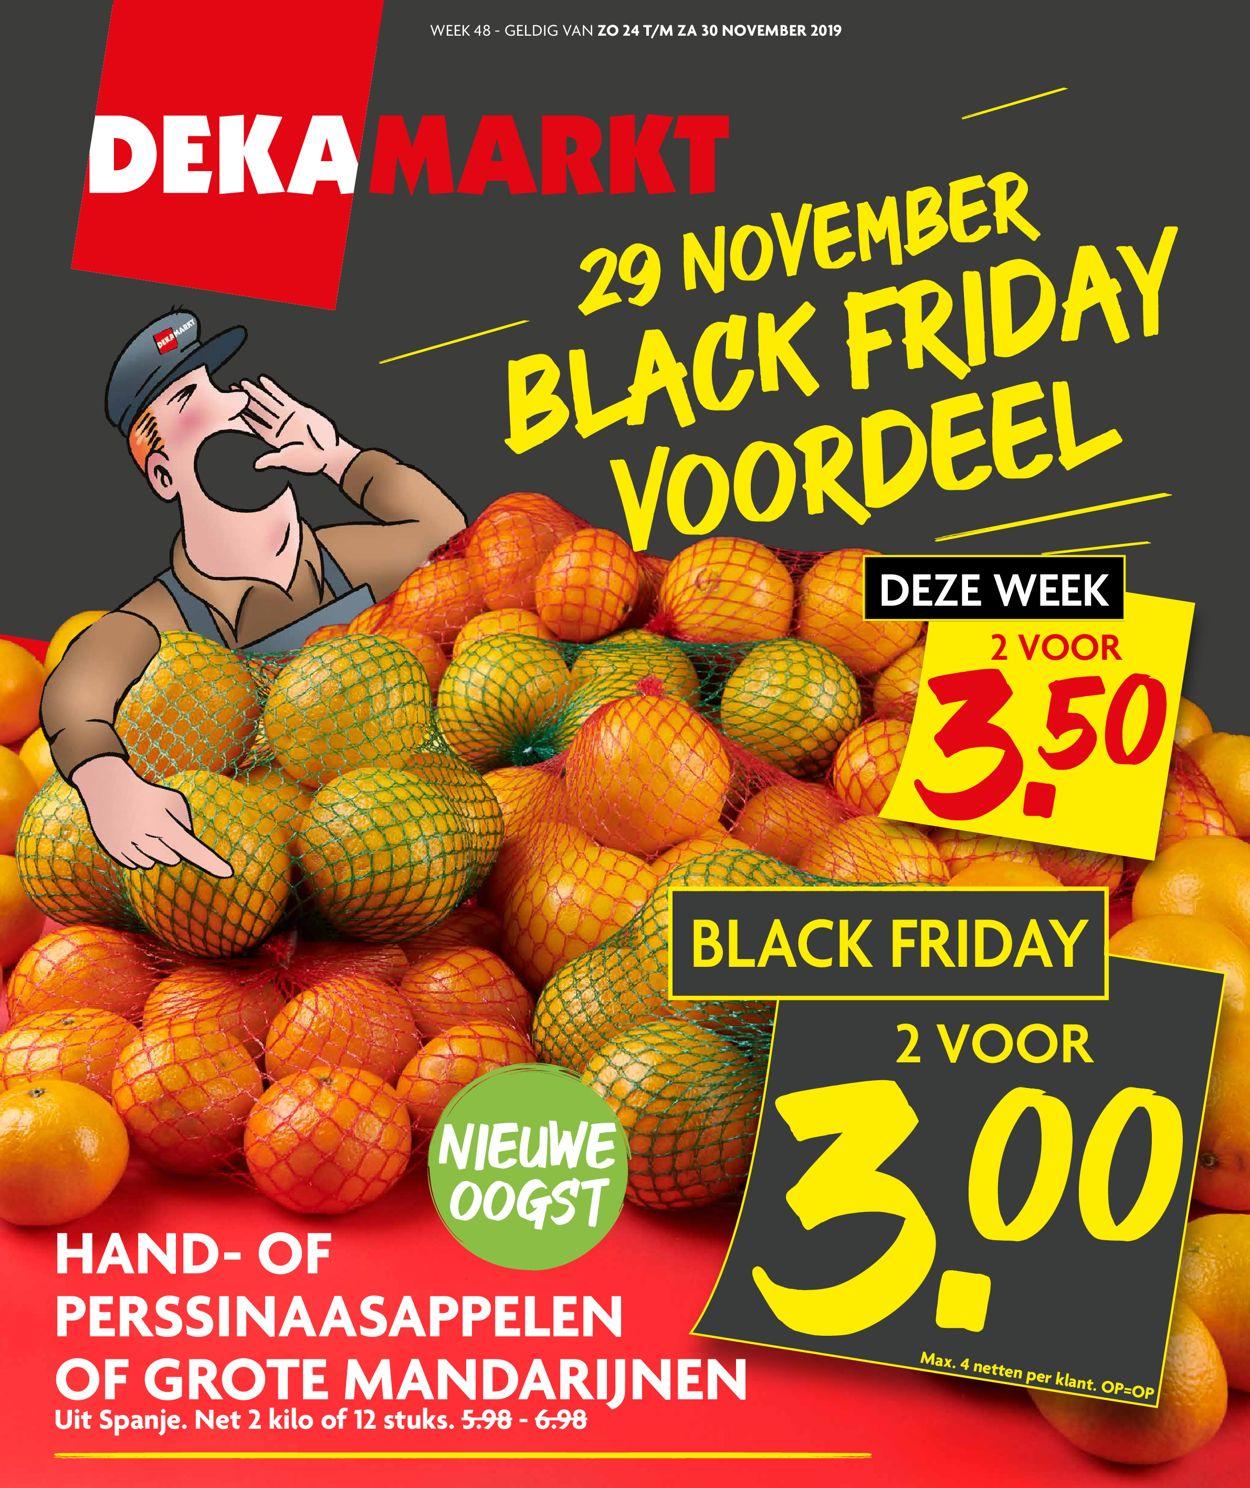 Dekamarkt - Black Friday 2019 Folder - 24.11-30.11.2019